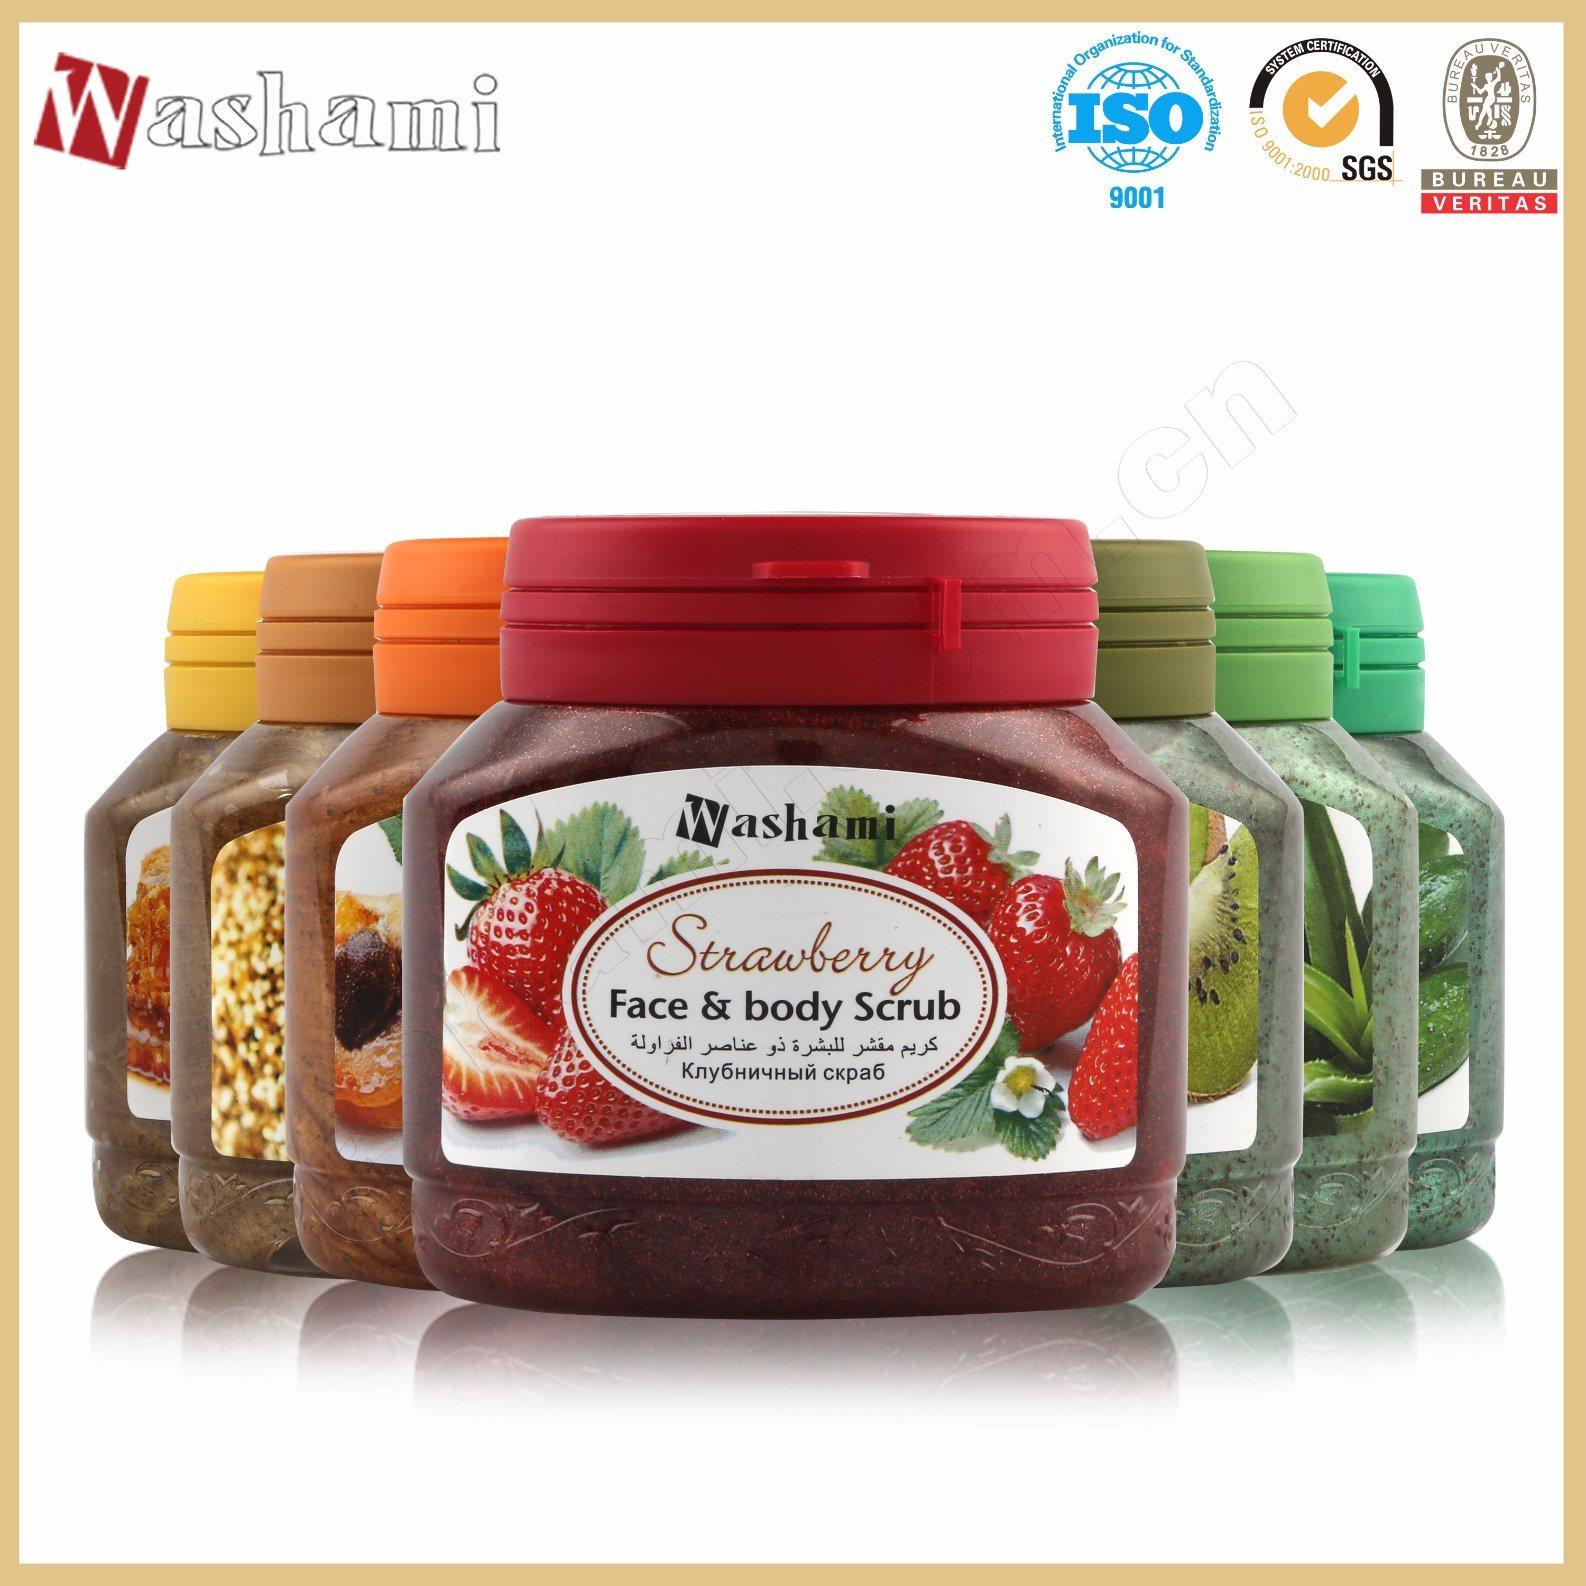 Washami Organic Natural Plant Essence Whitening Body Scrub with Pecan Shell Powder